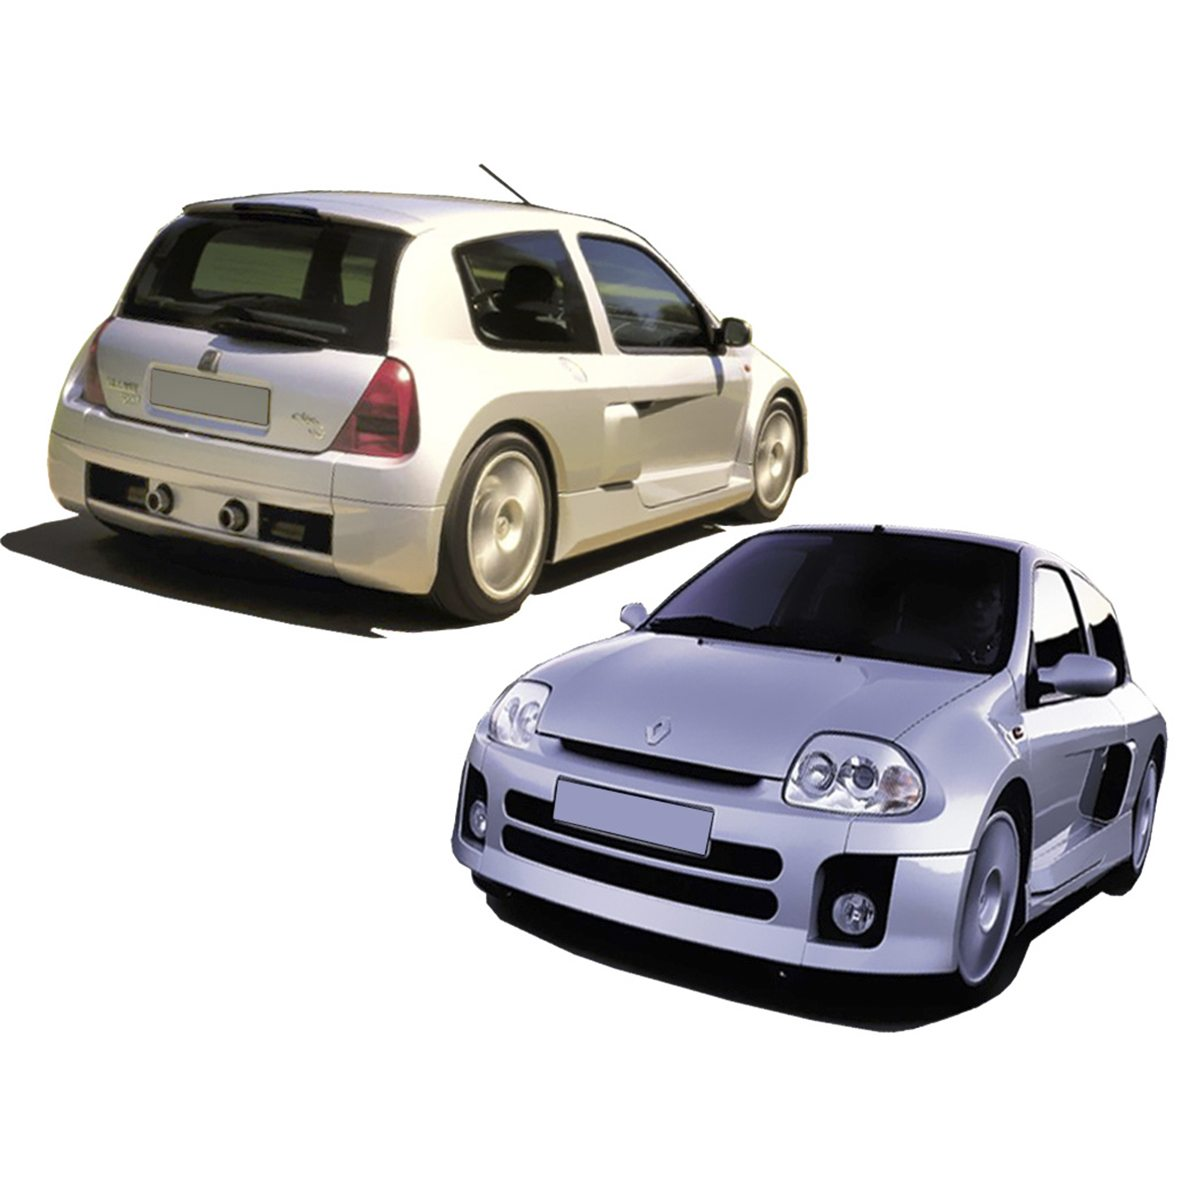 Renault-Clio-98-V6-KIT-QTU038